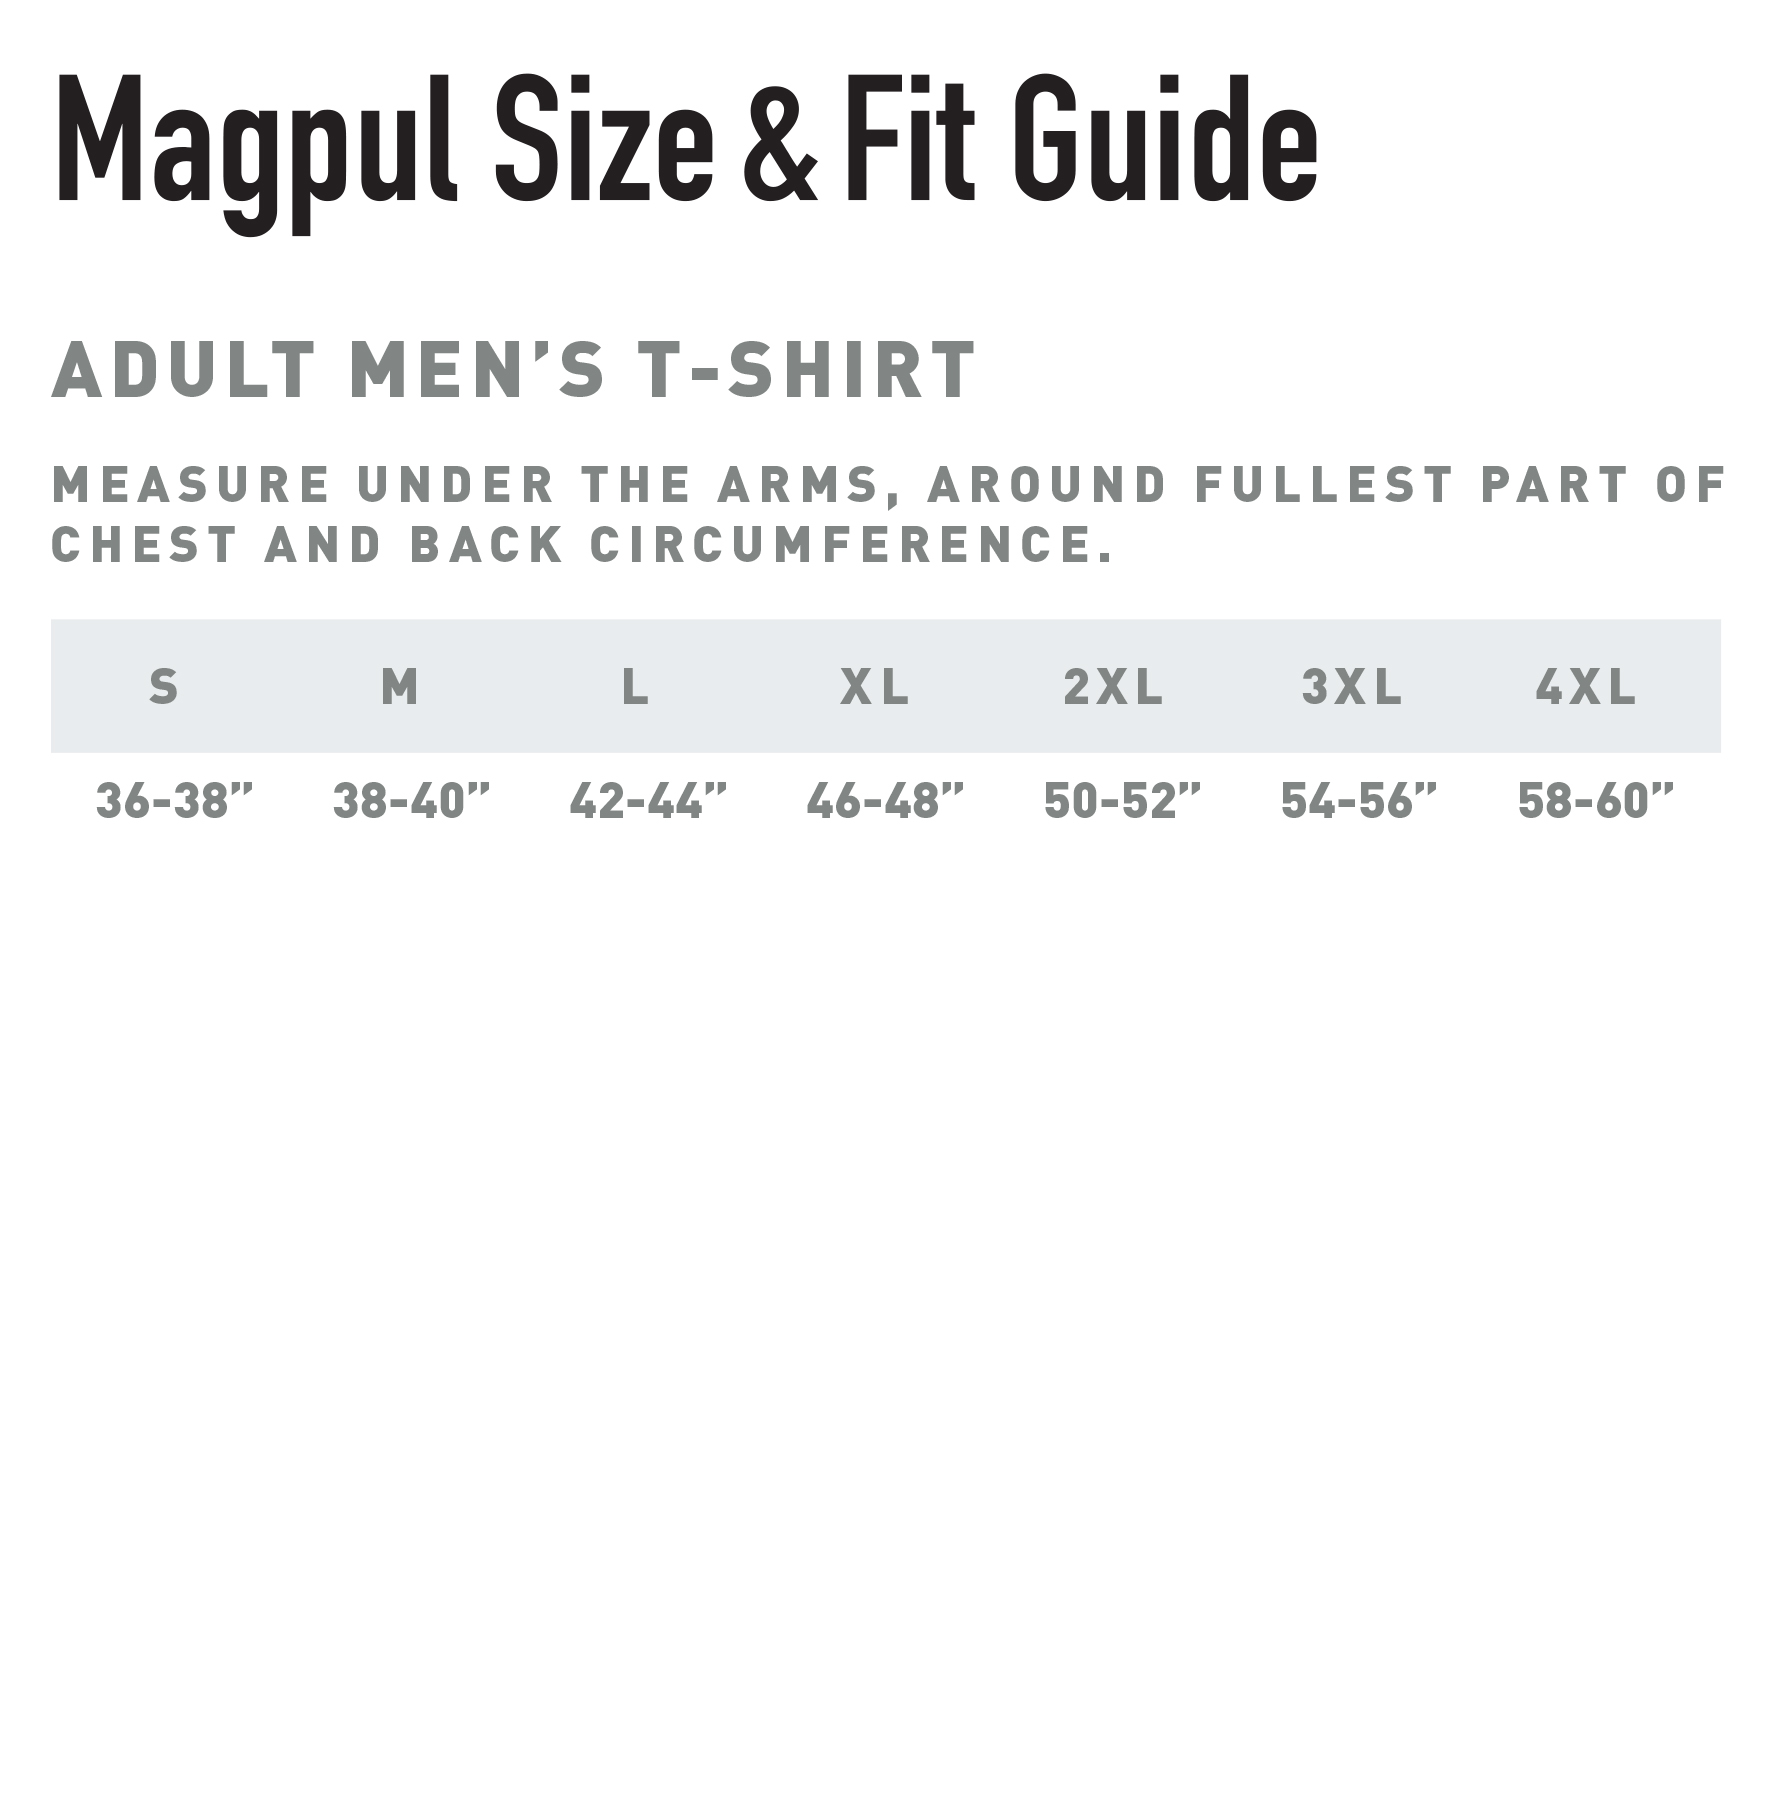 Magpul T-shirt size chart